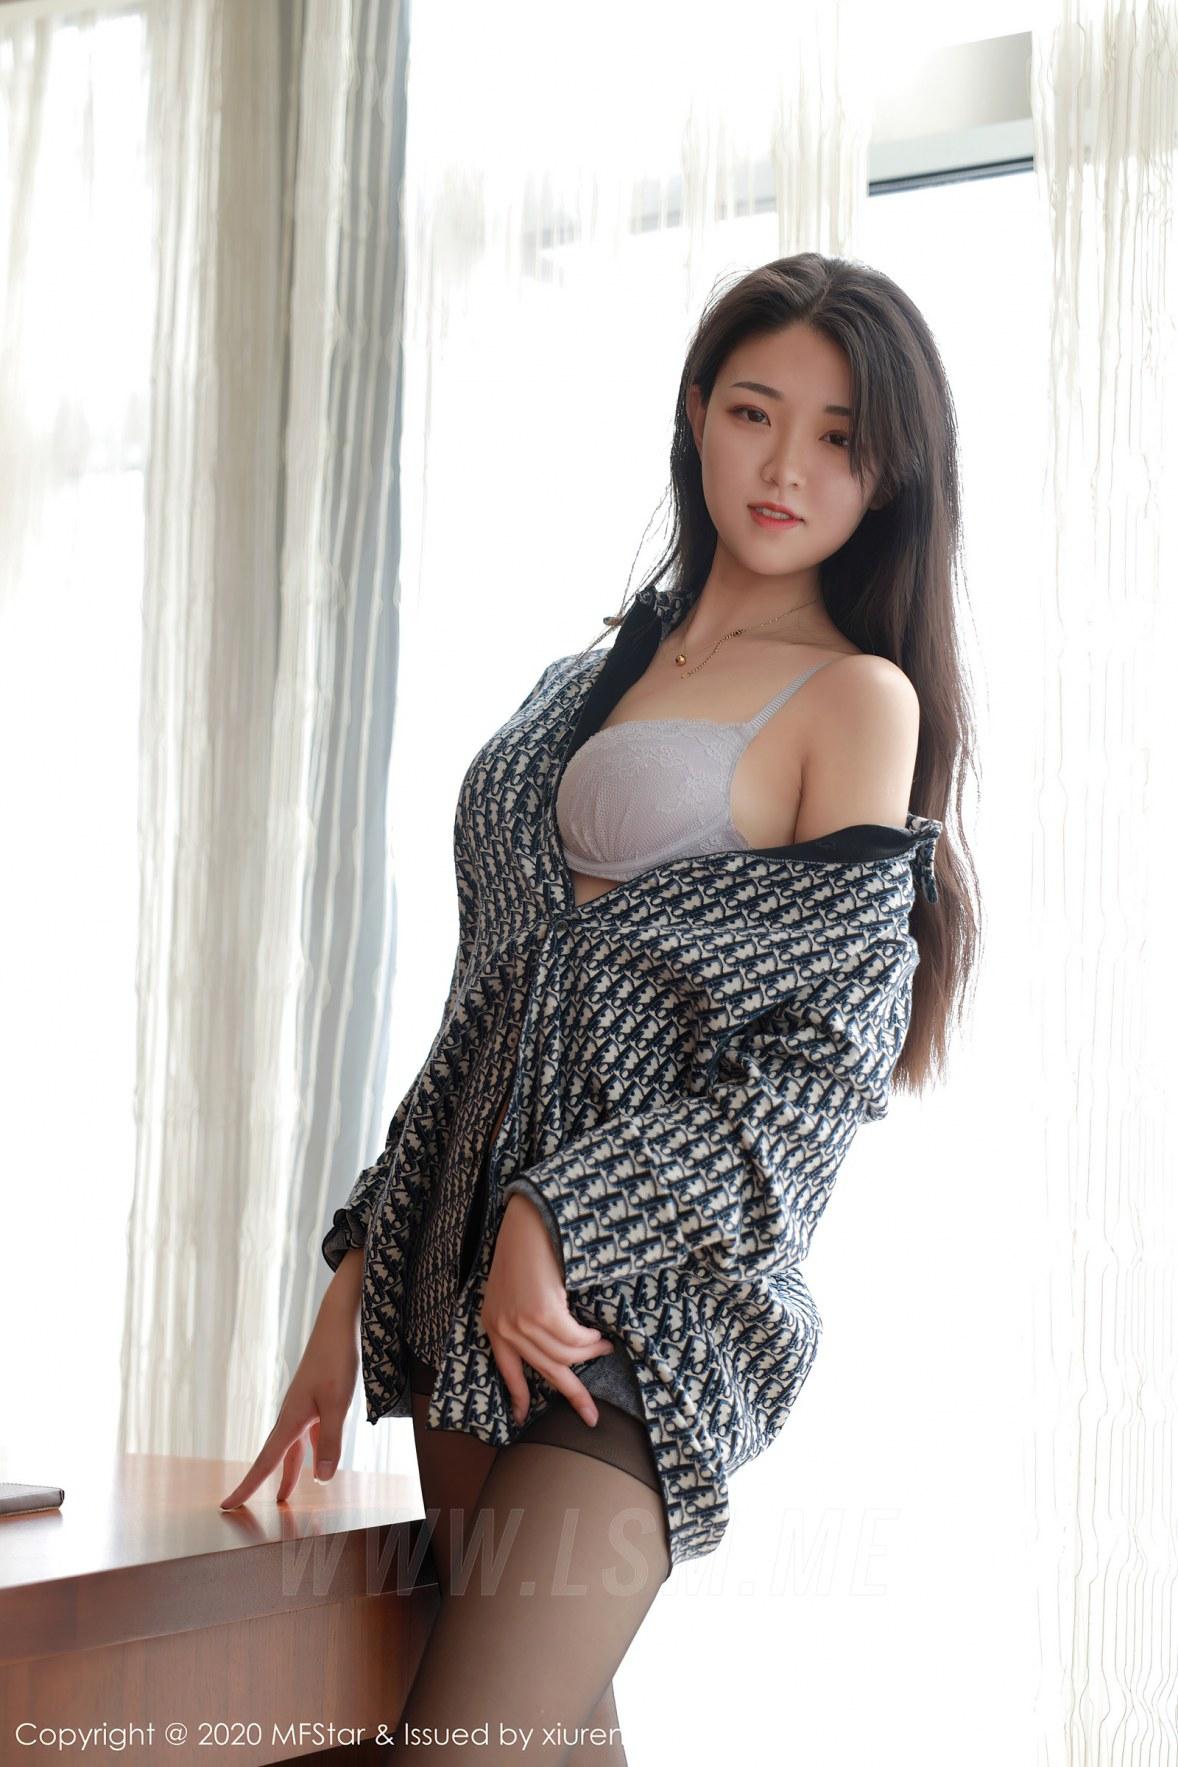 MFStar 模范学院 Vol.374  格子衬衫与黑丝细腿 苏雨彤 - 2